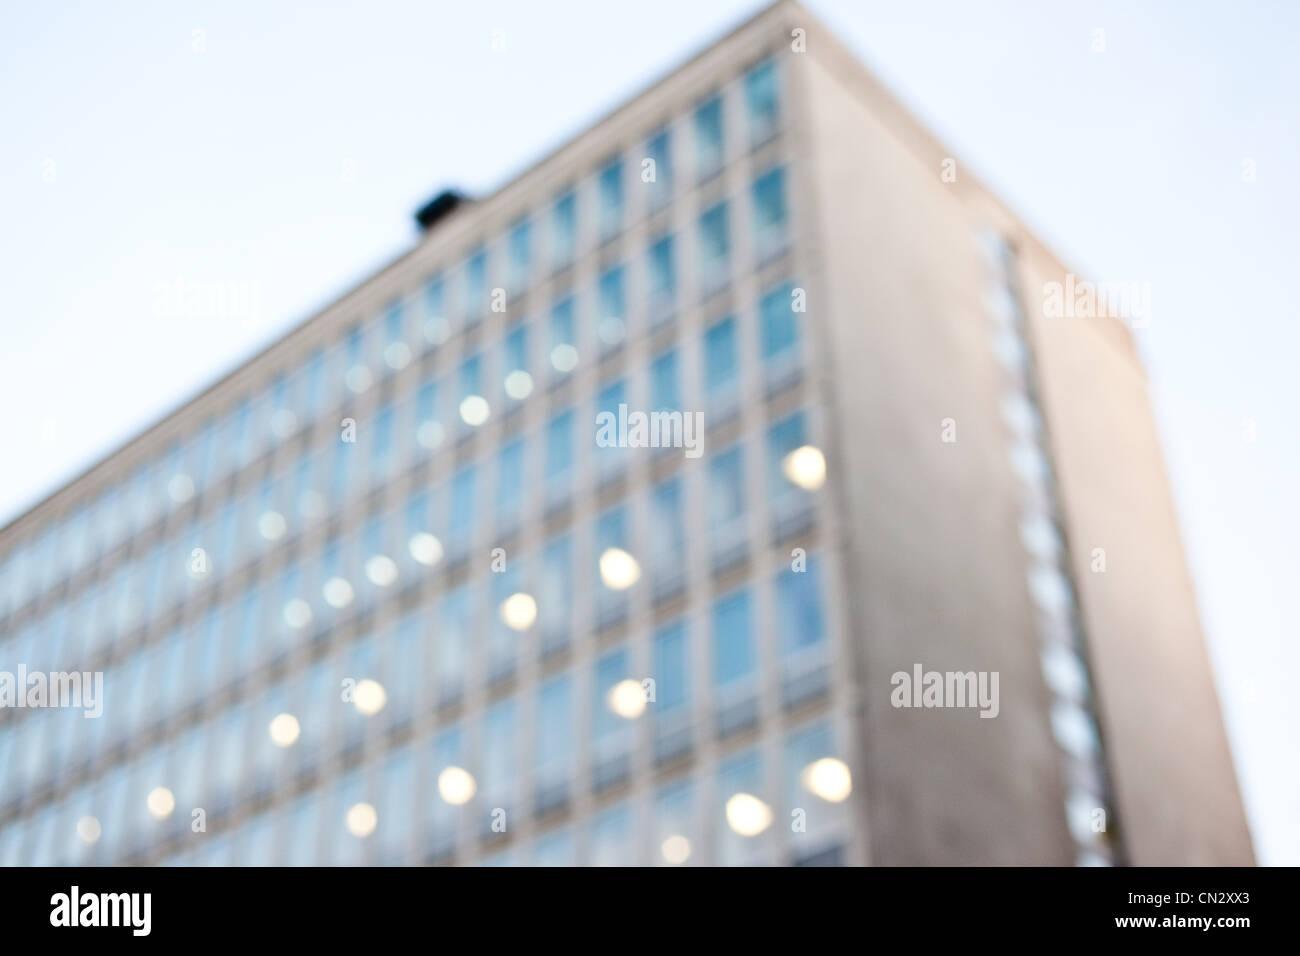 Verschwommene Gebäudehülle, London, England Stockbild